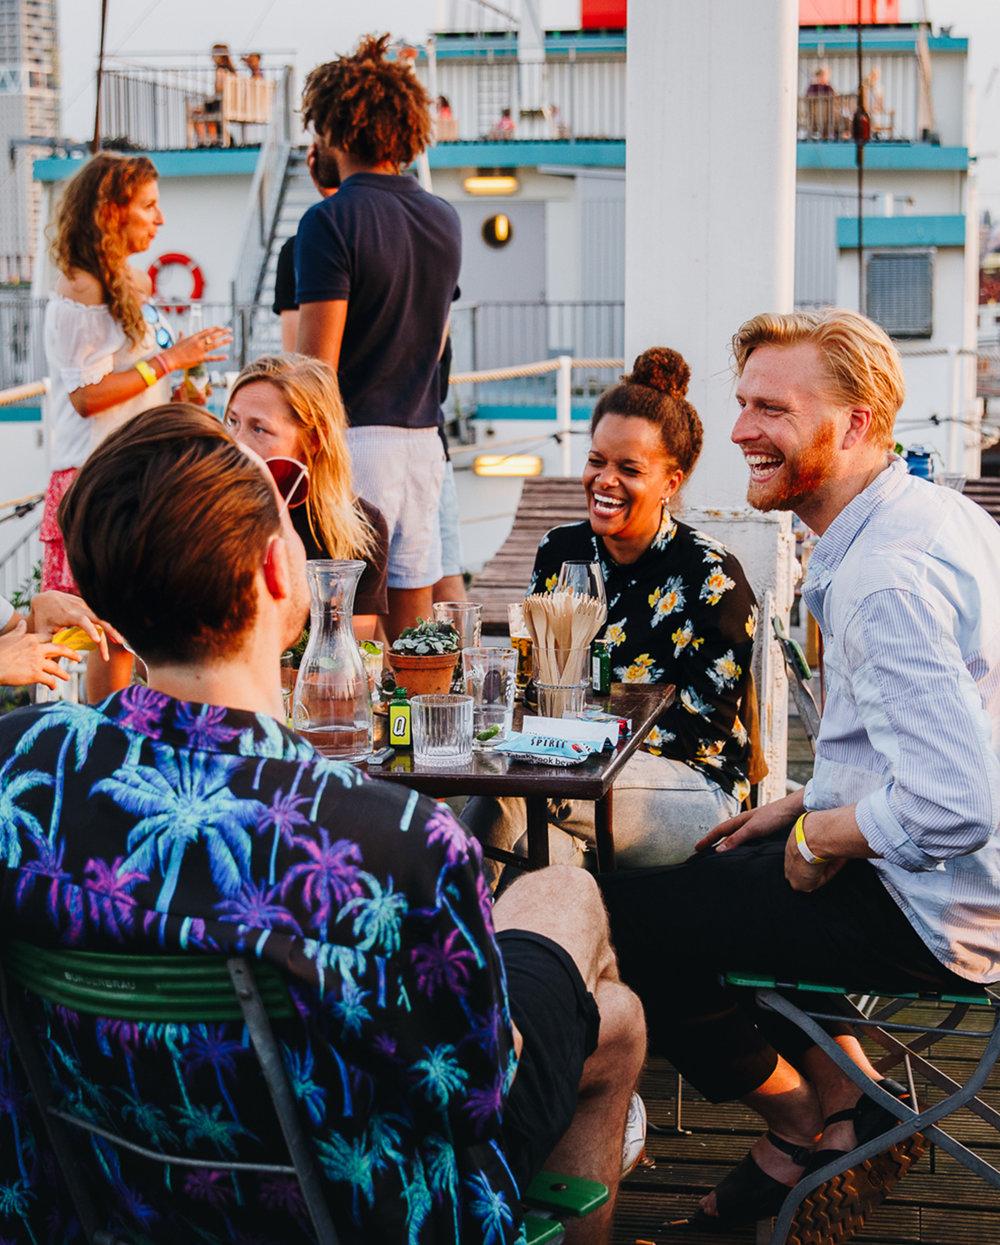 NIET-AWKWARD NETWERK EVENTS - Q1 - Freelance Date Night - 14 feb. 2019Q2 - Het Freelance Bedrijfsuitje - 6 jun. 2019Q3 - The Freelance Get Together - 29 sept. 2019Q4 - Coming up!